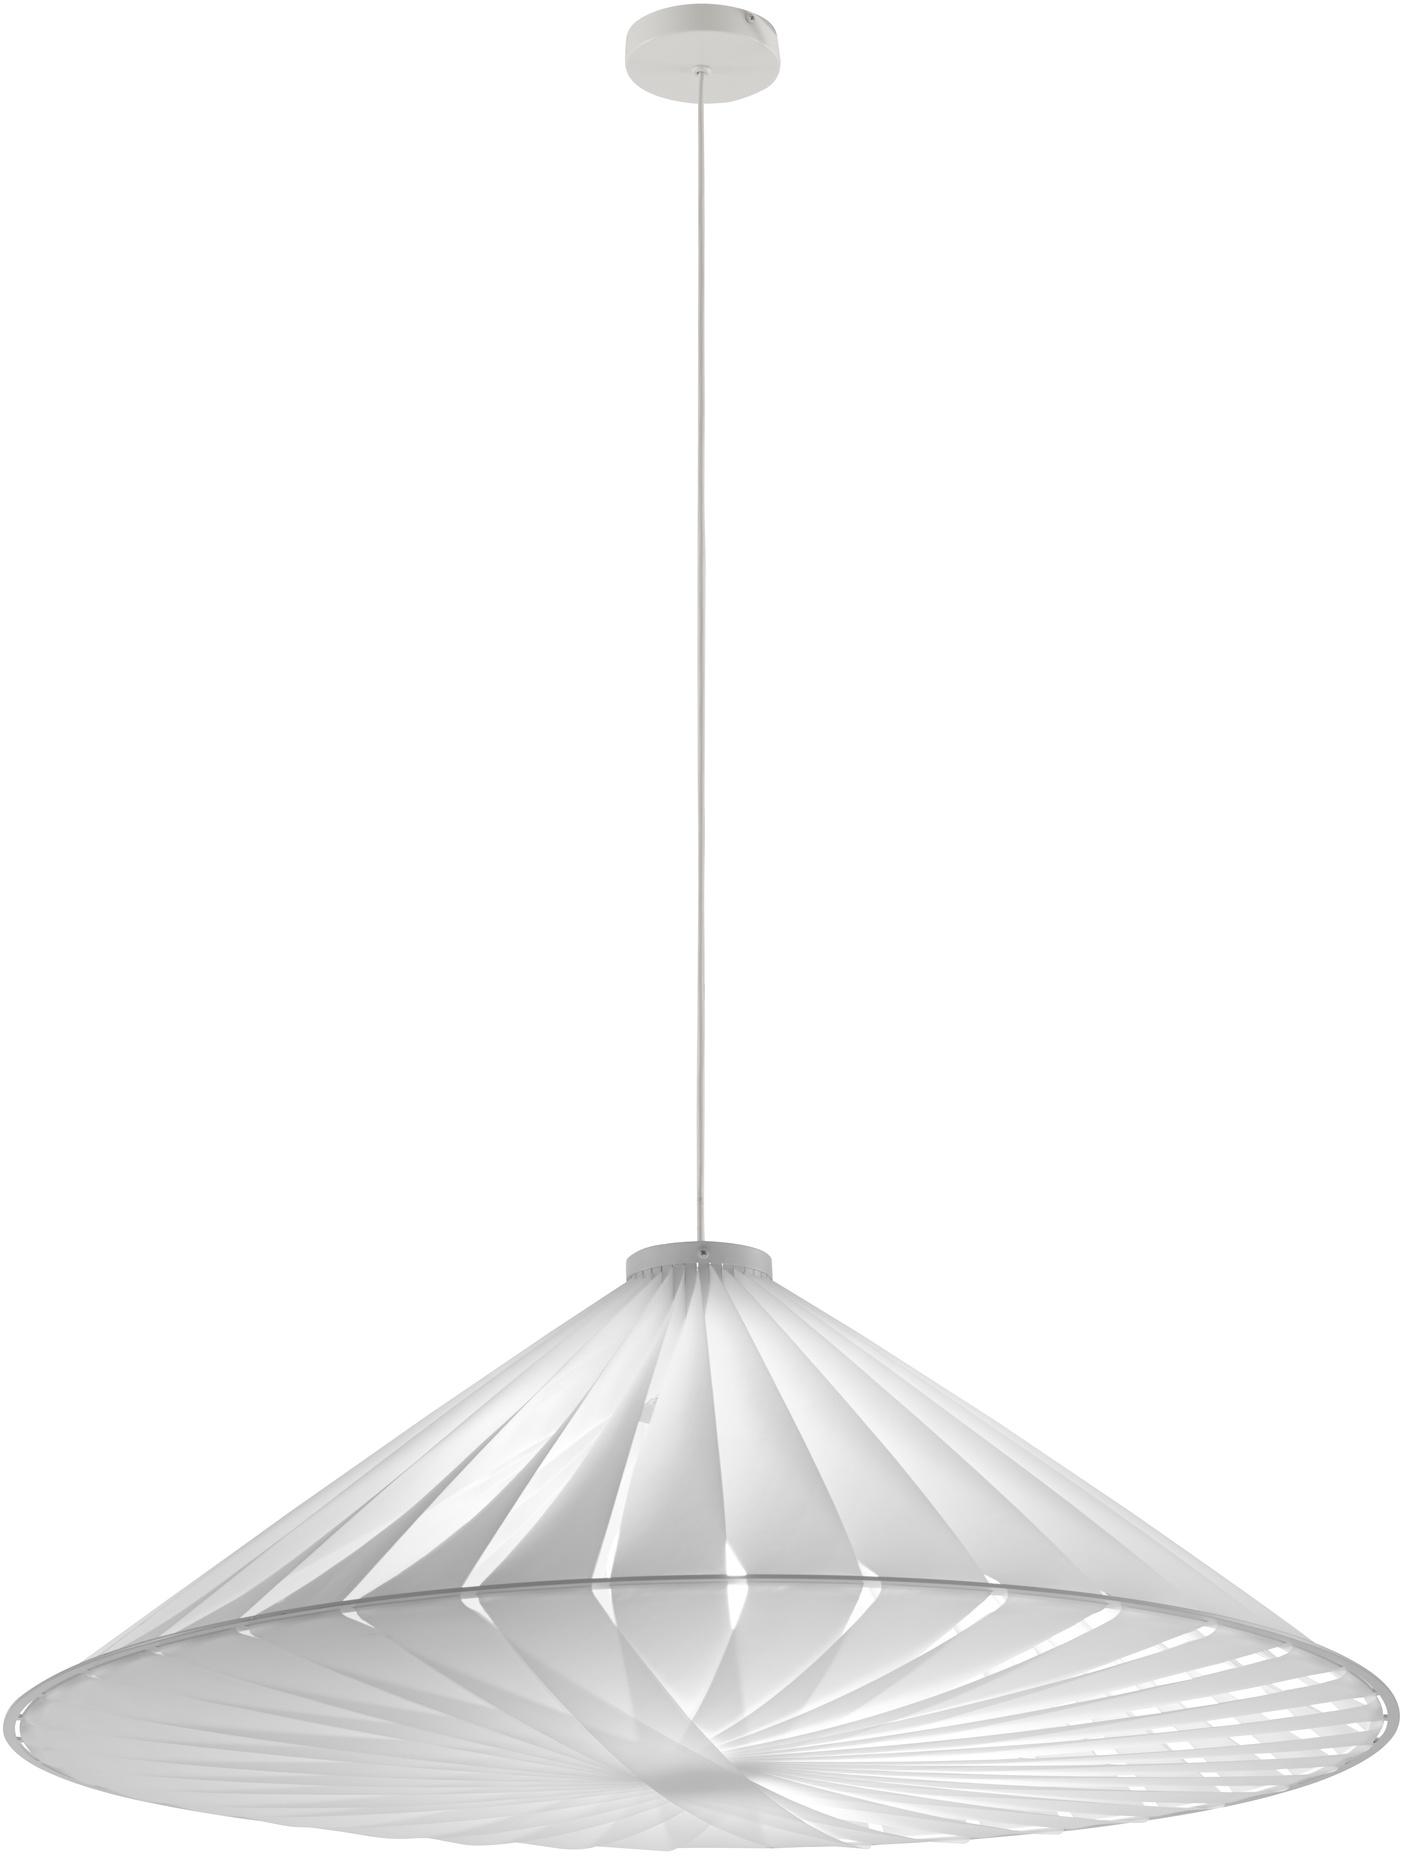 carrousel suspension designer veronika wildgruber ligne roset. Black Bedroom Furniture Sets. Home Design Ideas